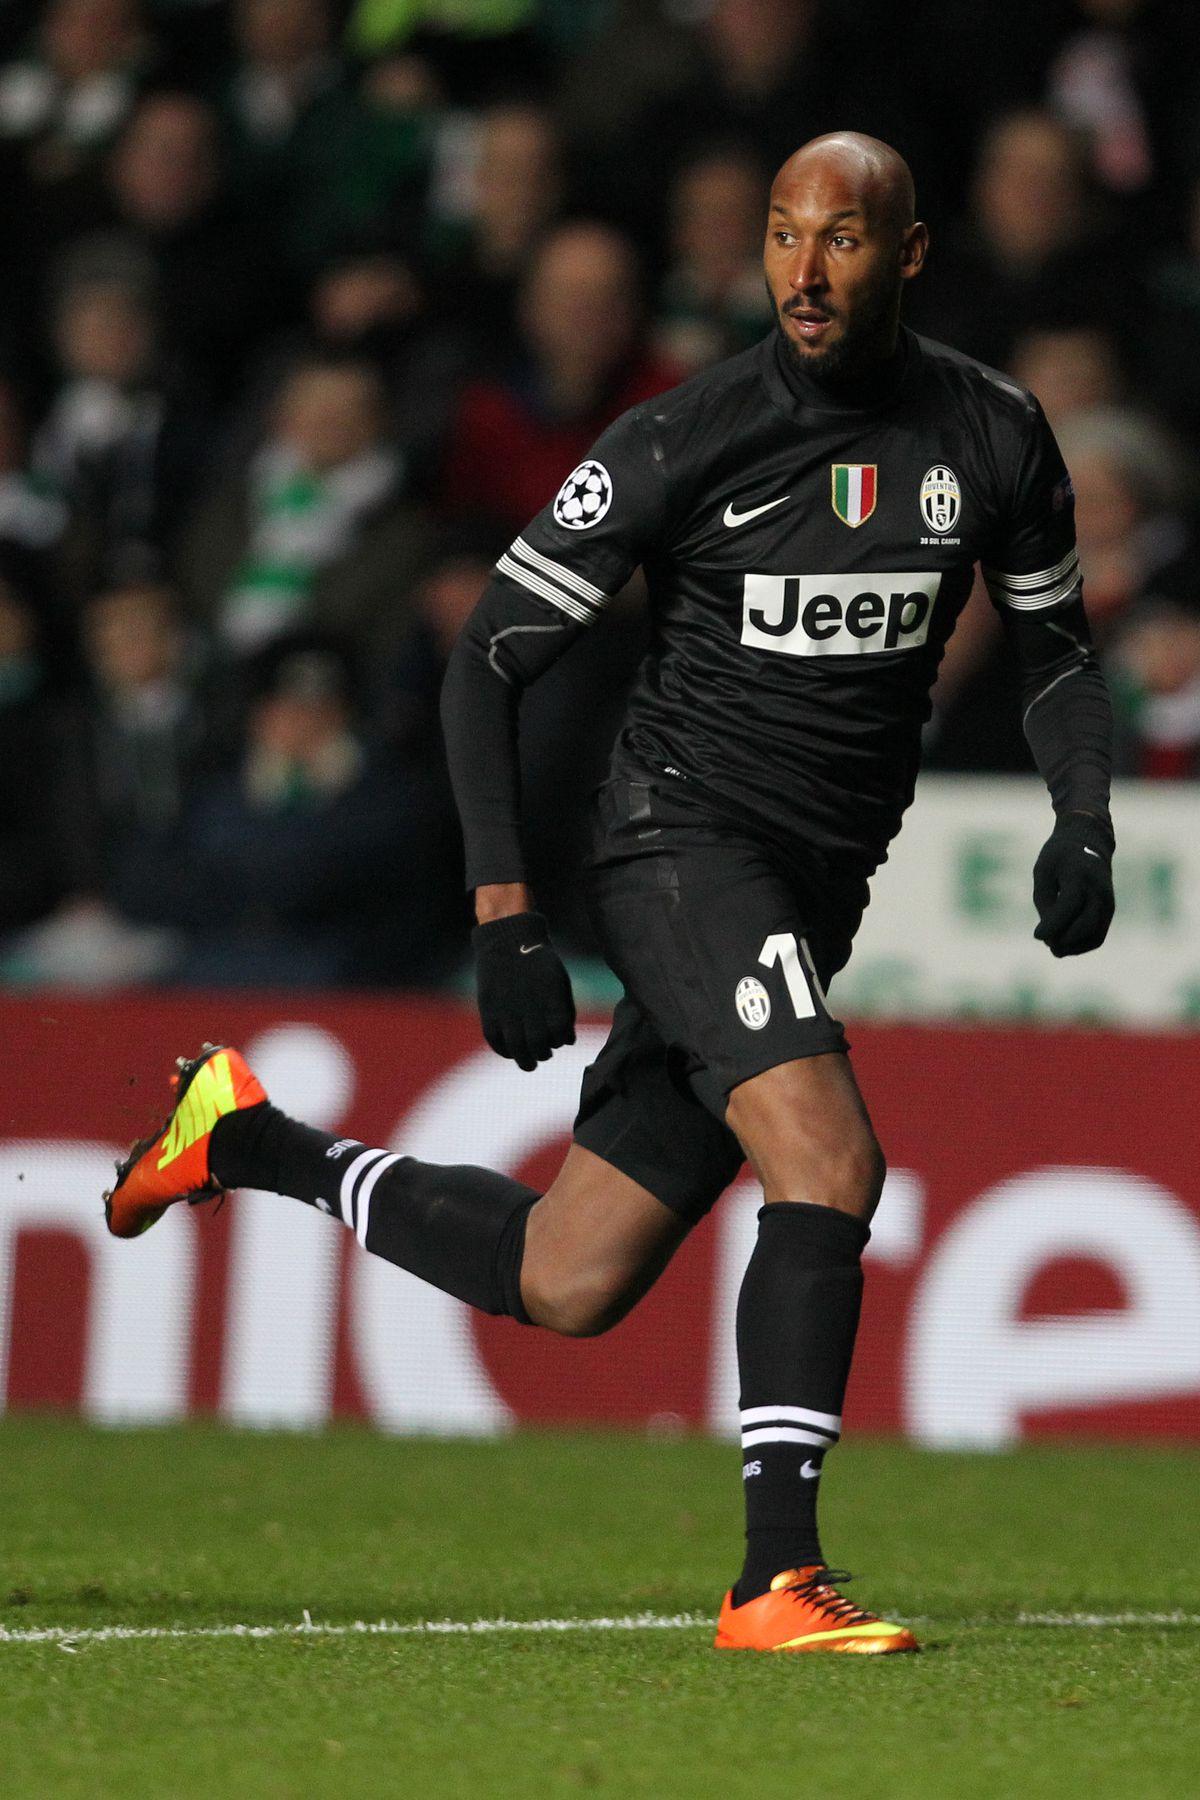 Soccer - UEFA Champions League - Round of Sixteen - First Leg - Celtic v Juventus - Celtic Park